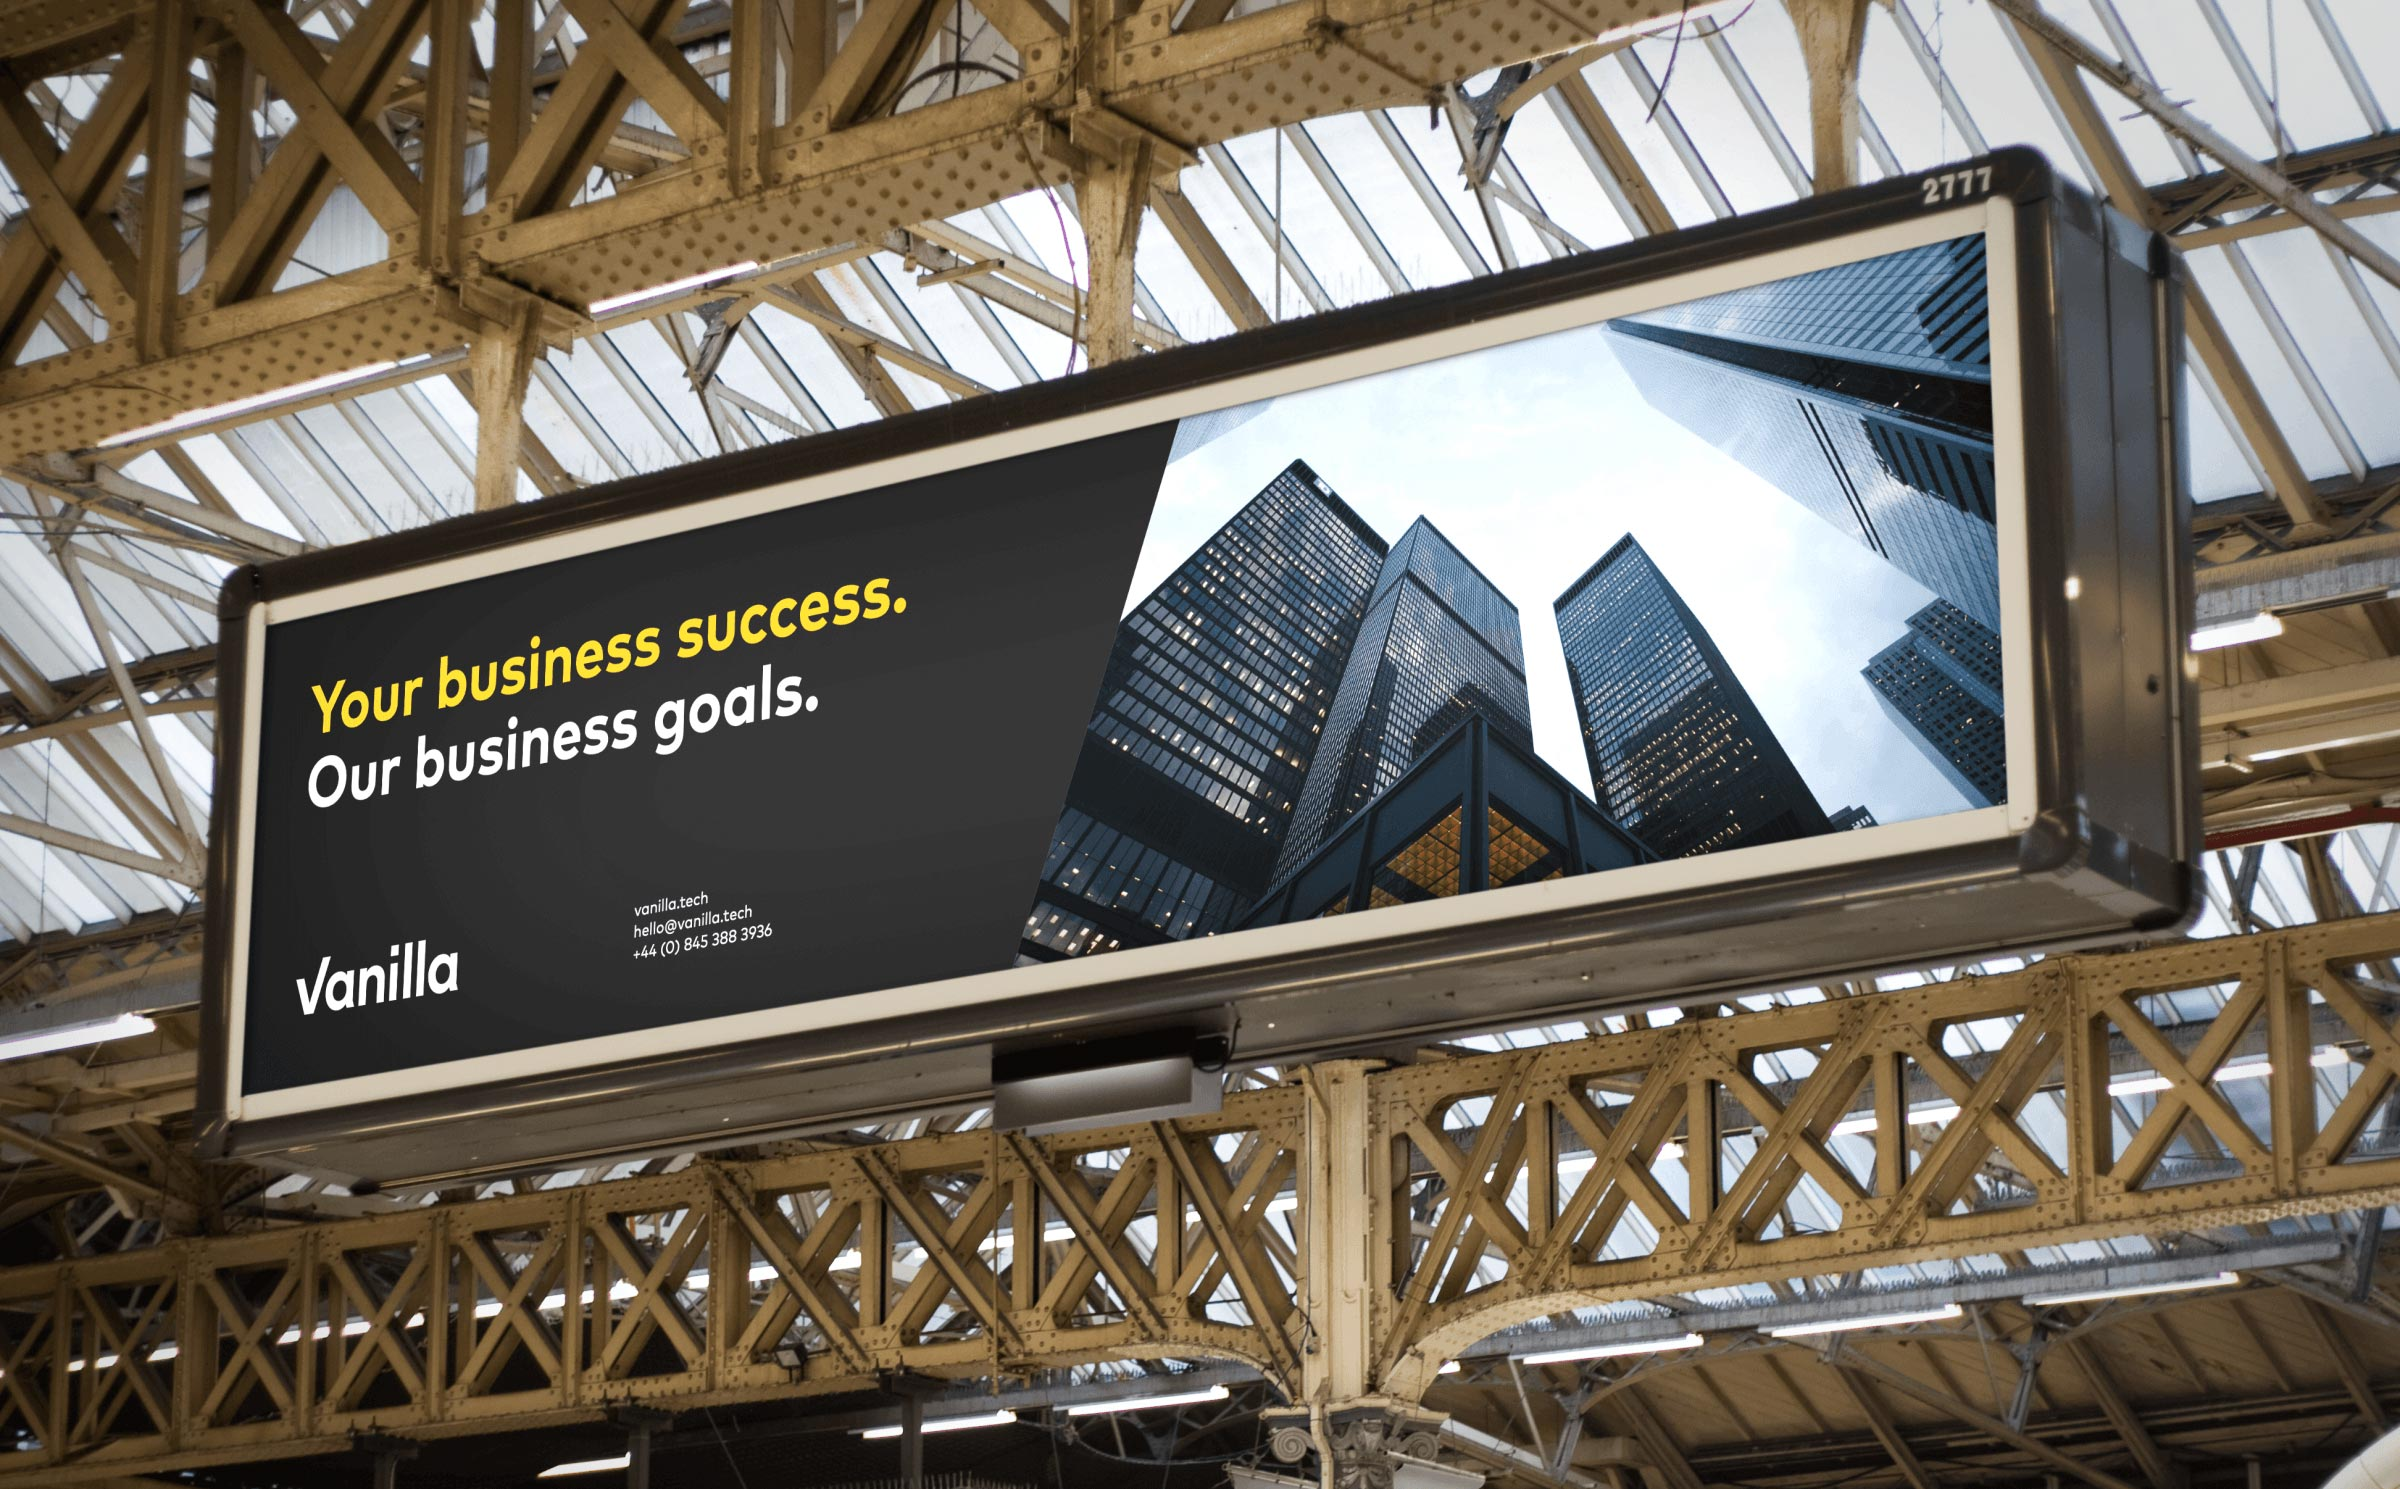 Billboard design for Vanilla